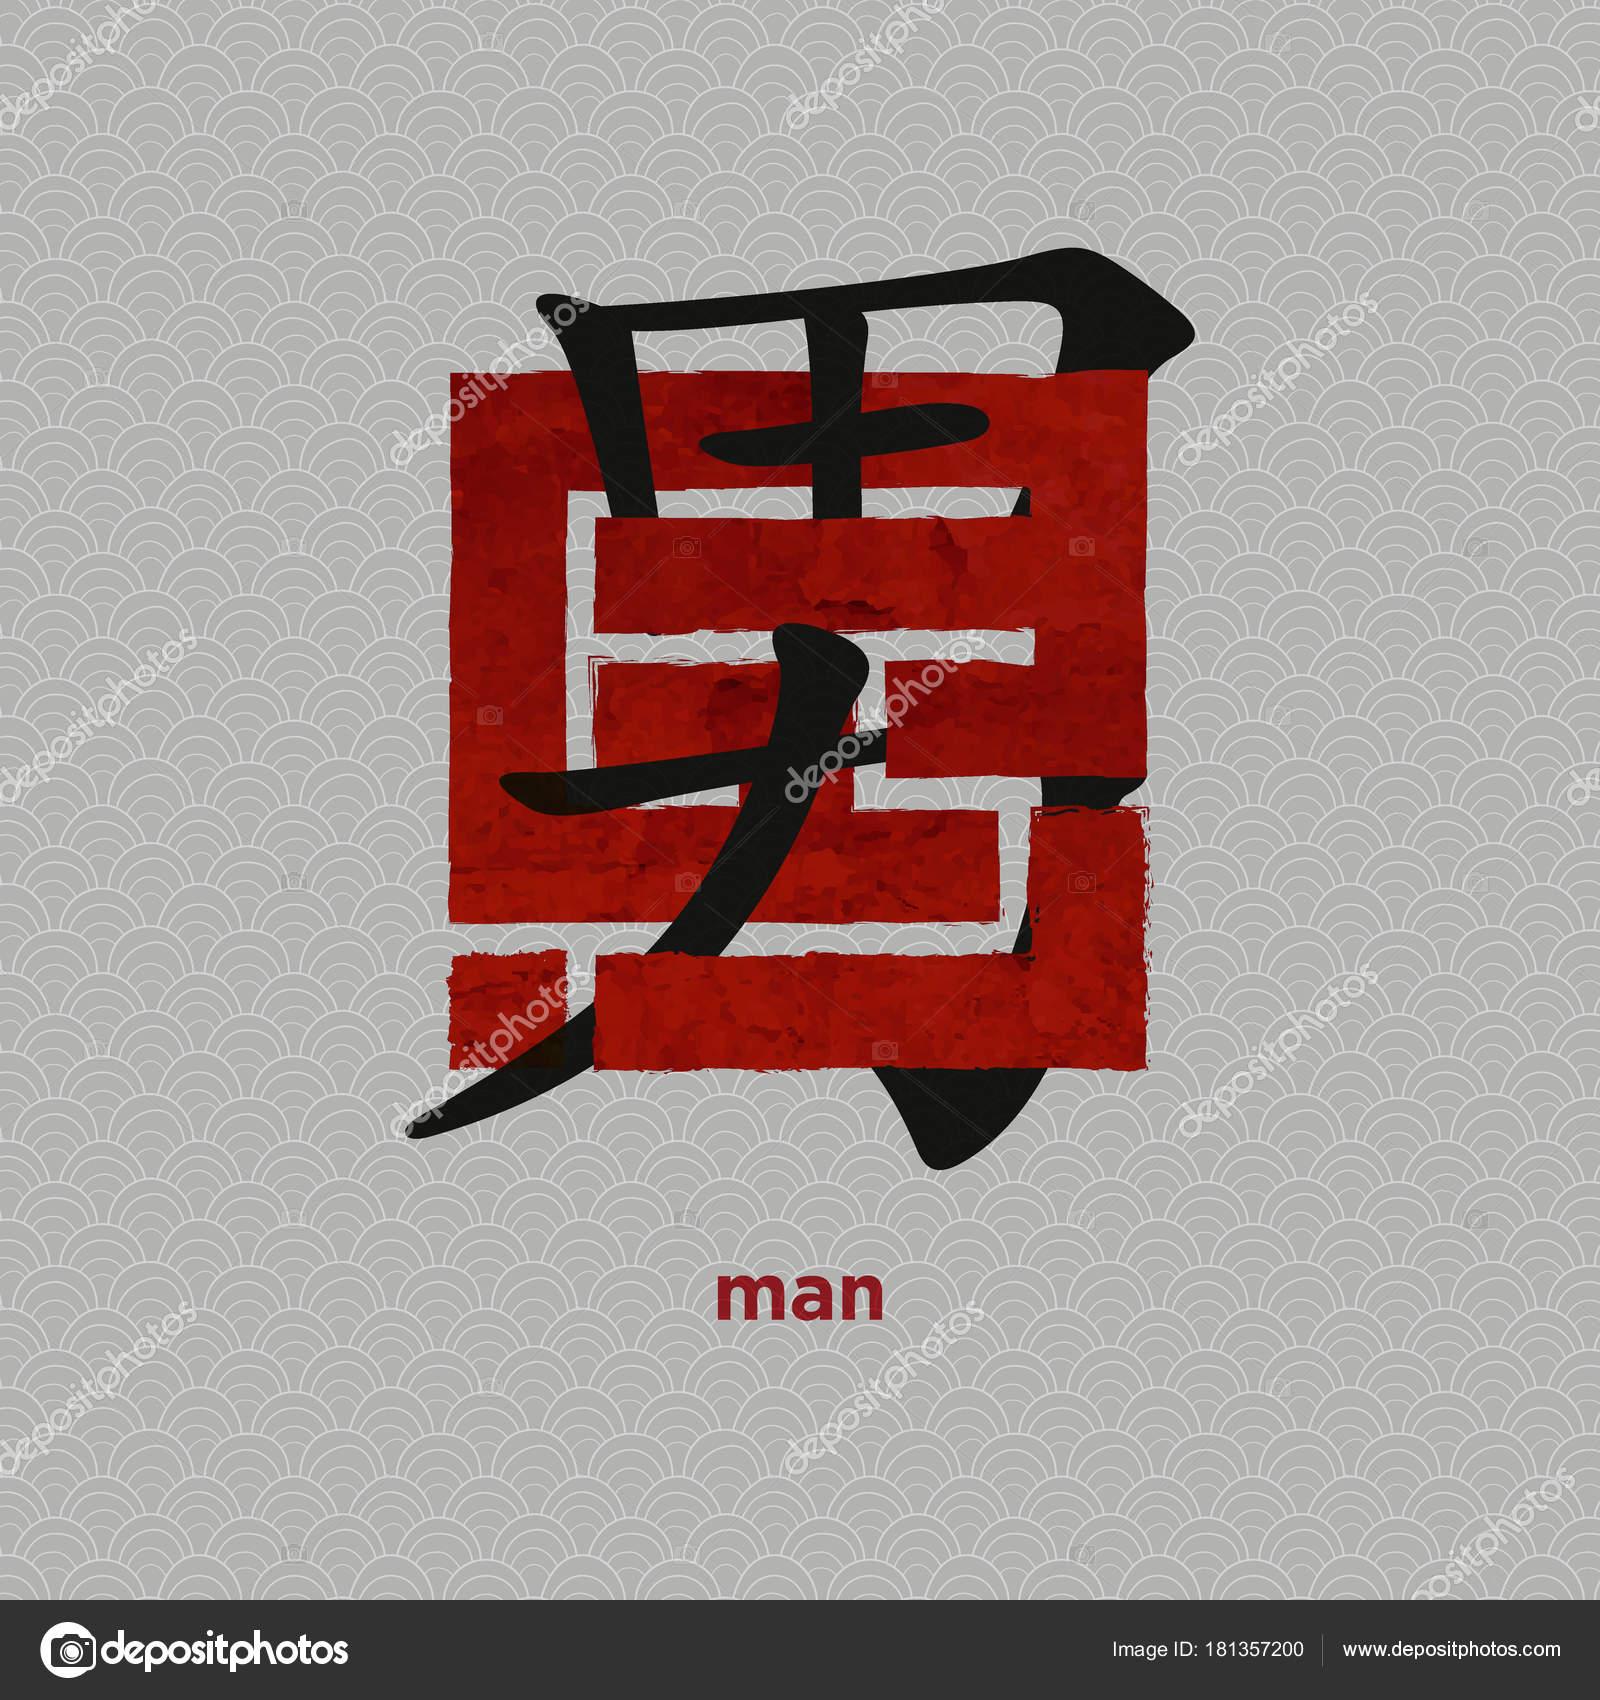 Islamic Kufic Calligraphy Japanese Letter Kanji Man Asian Pattern